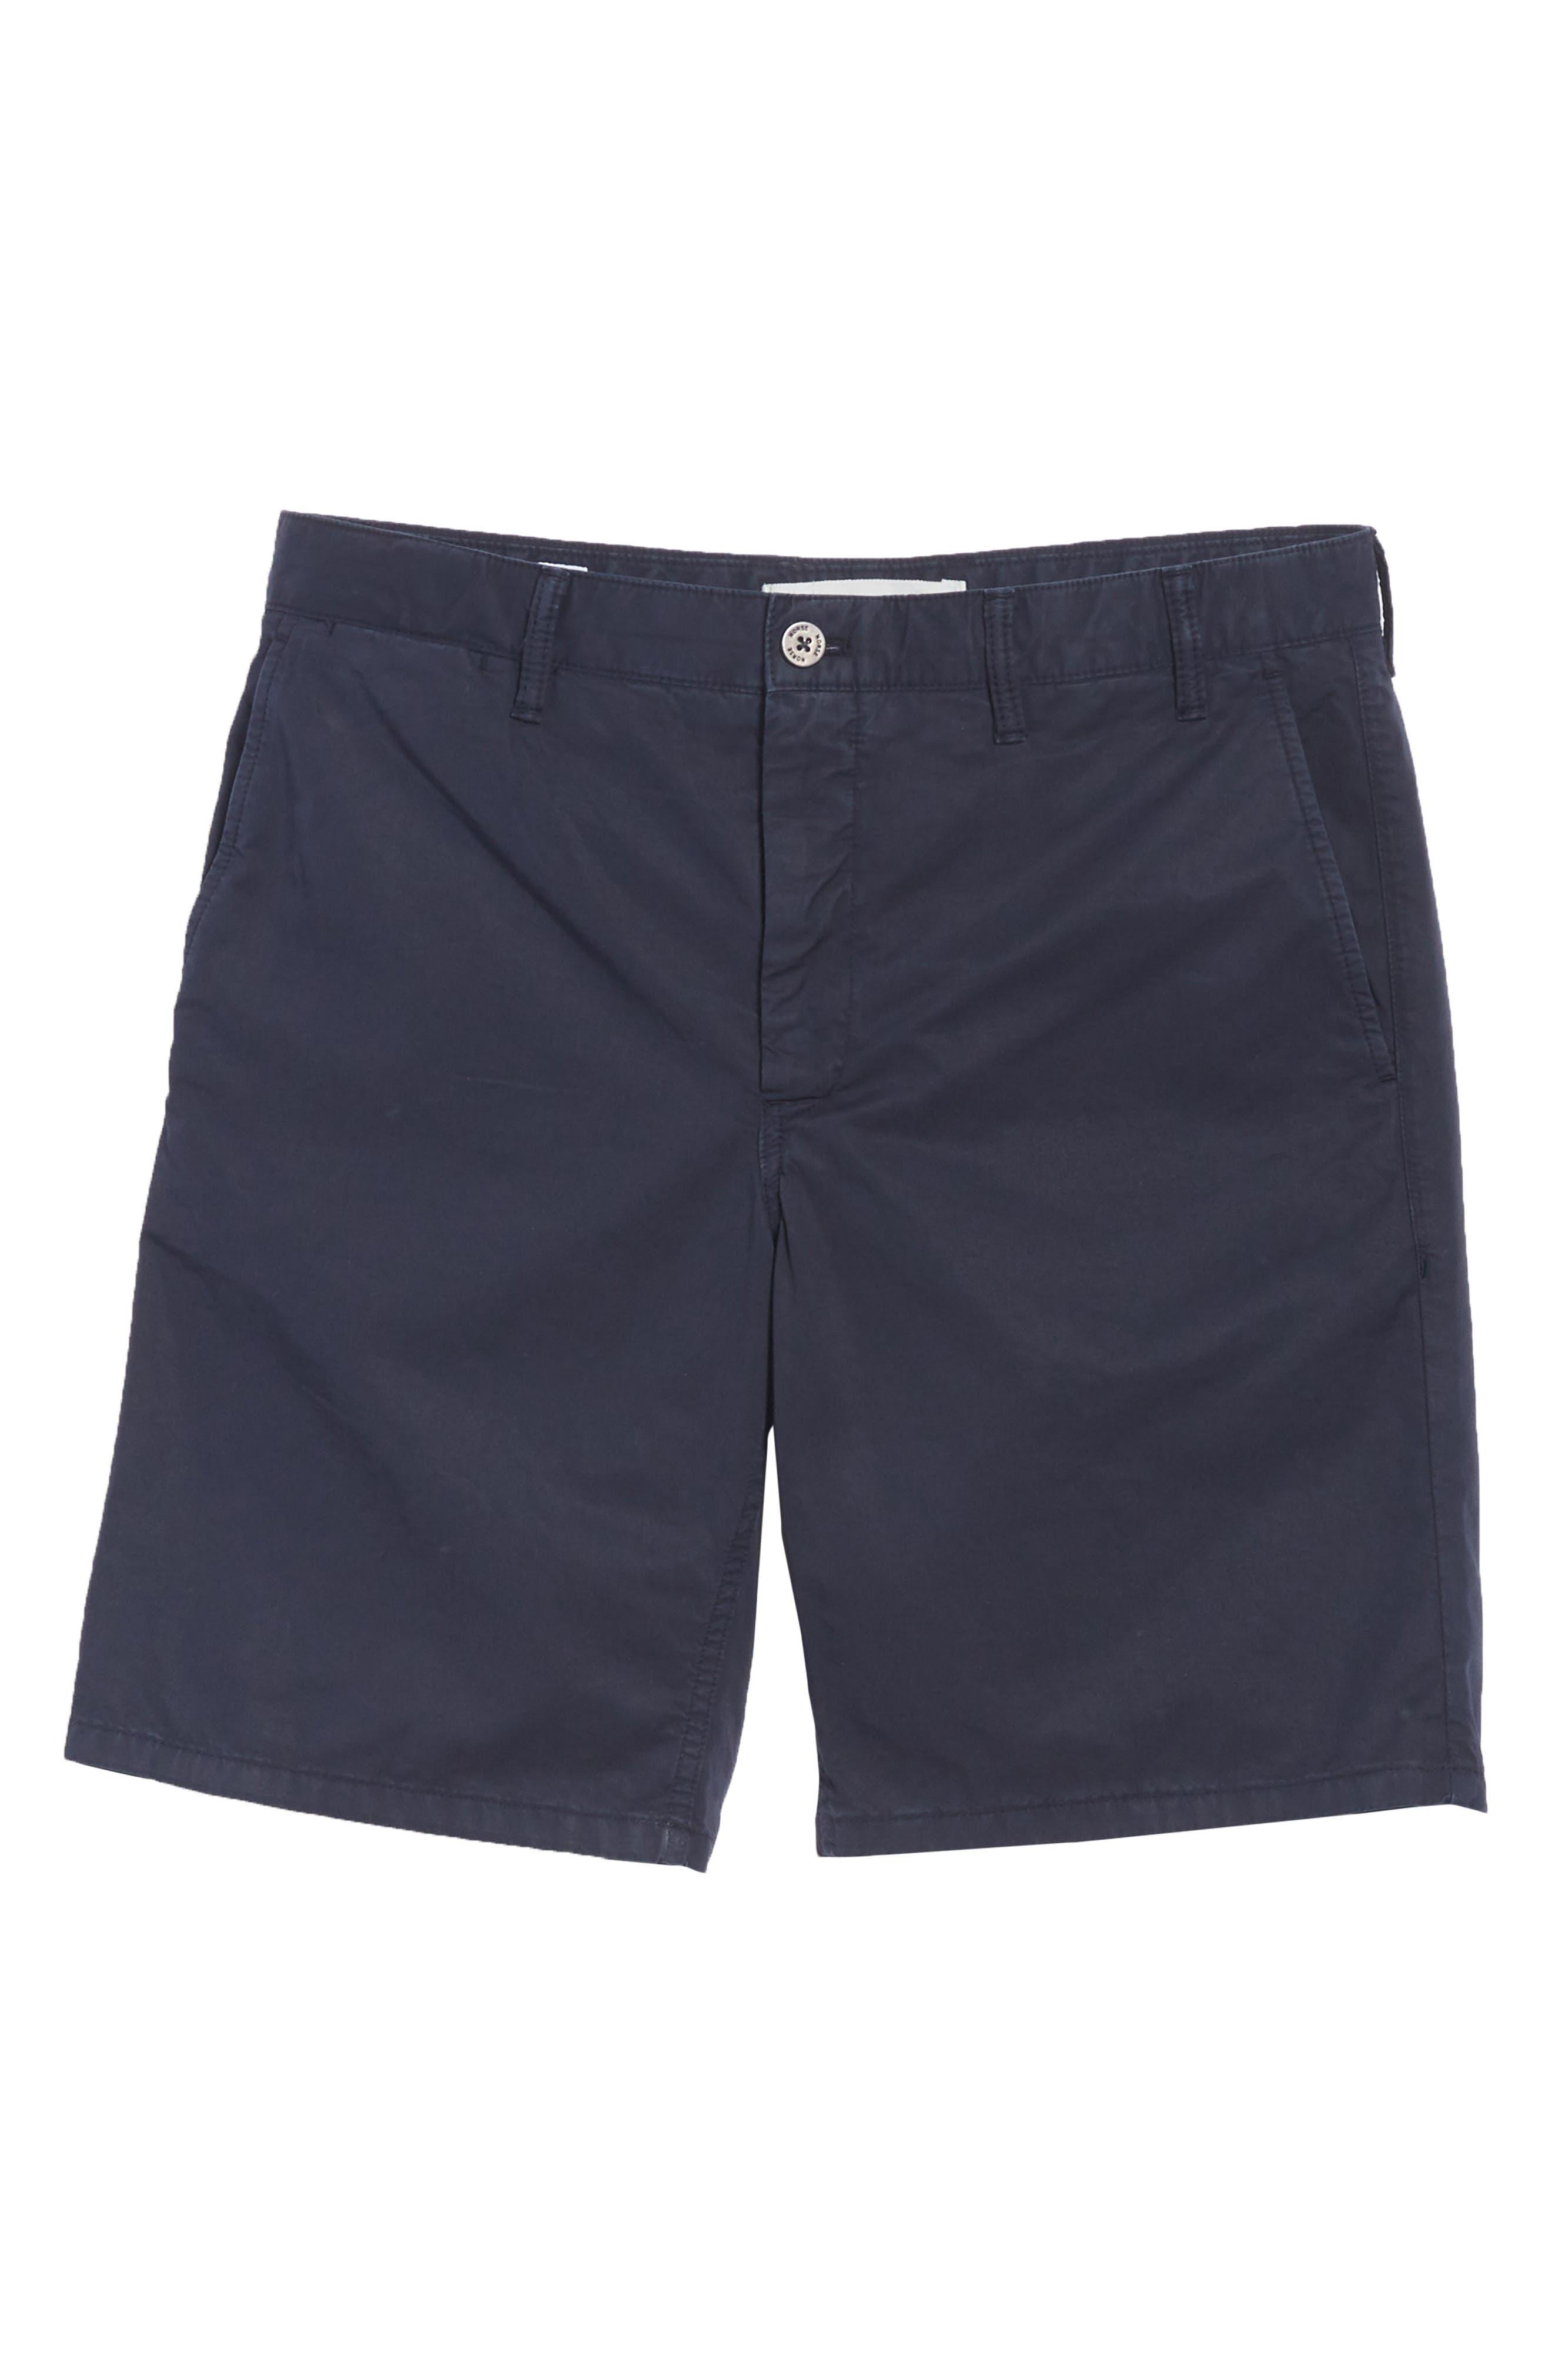 Aros Twill Shorts,                             Alternate thumbnail 6, color,                             Dark Navy